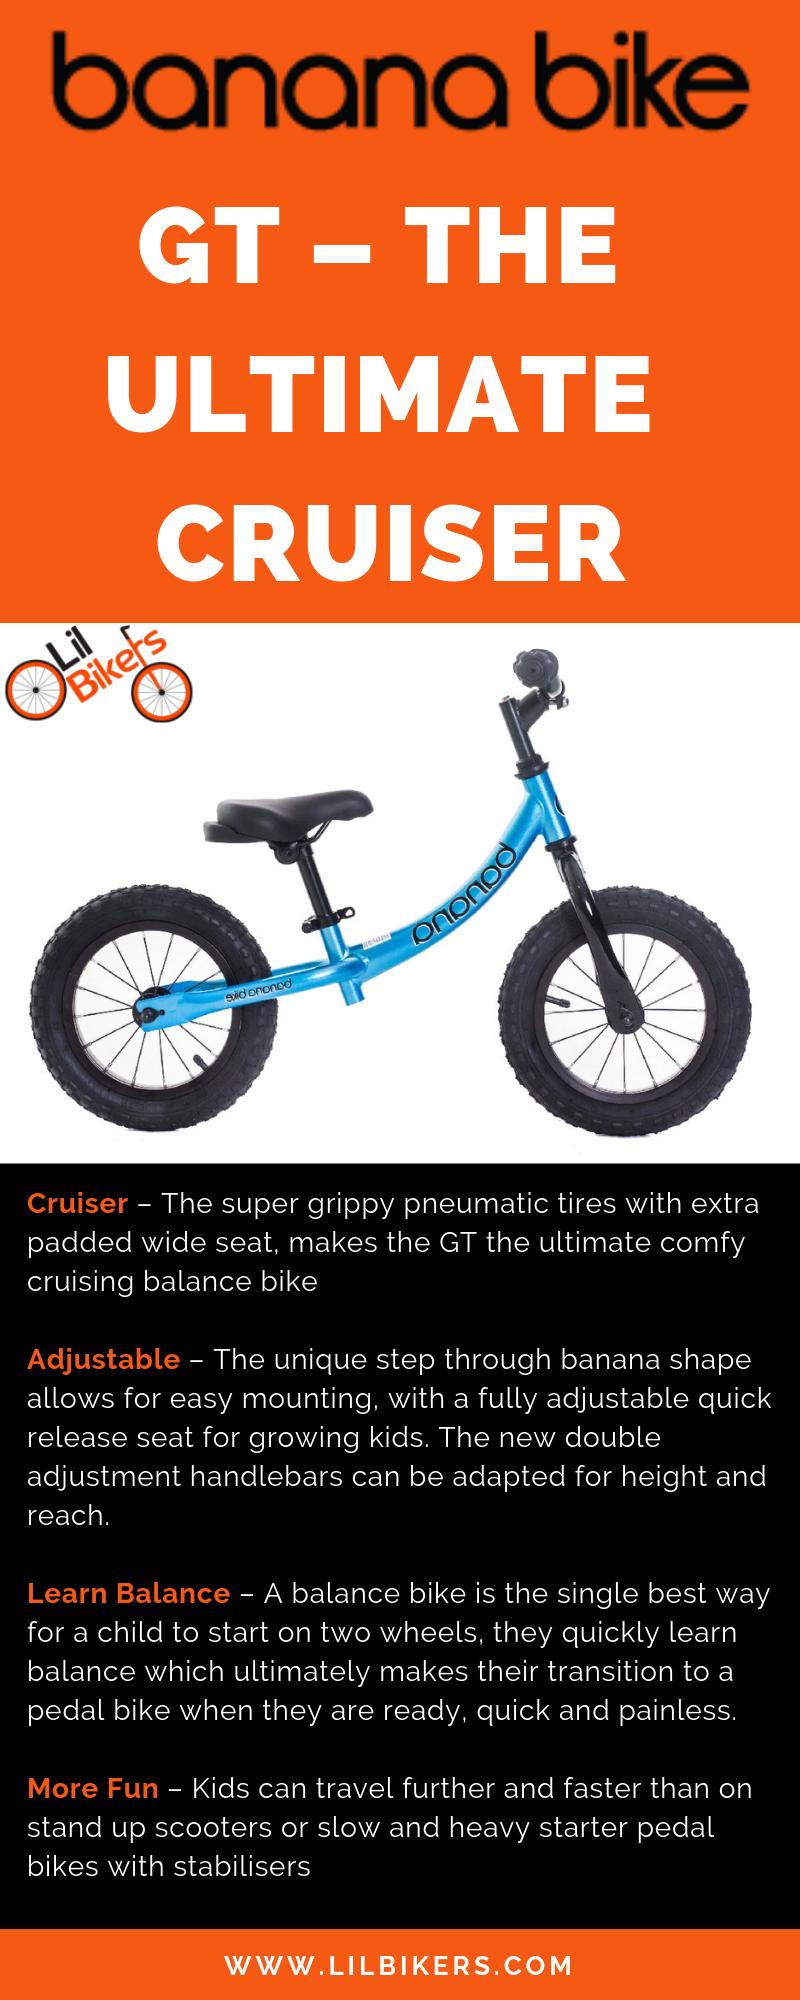 Banana Balance Bike Review With Images Bike Reviews Balance